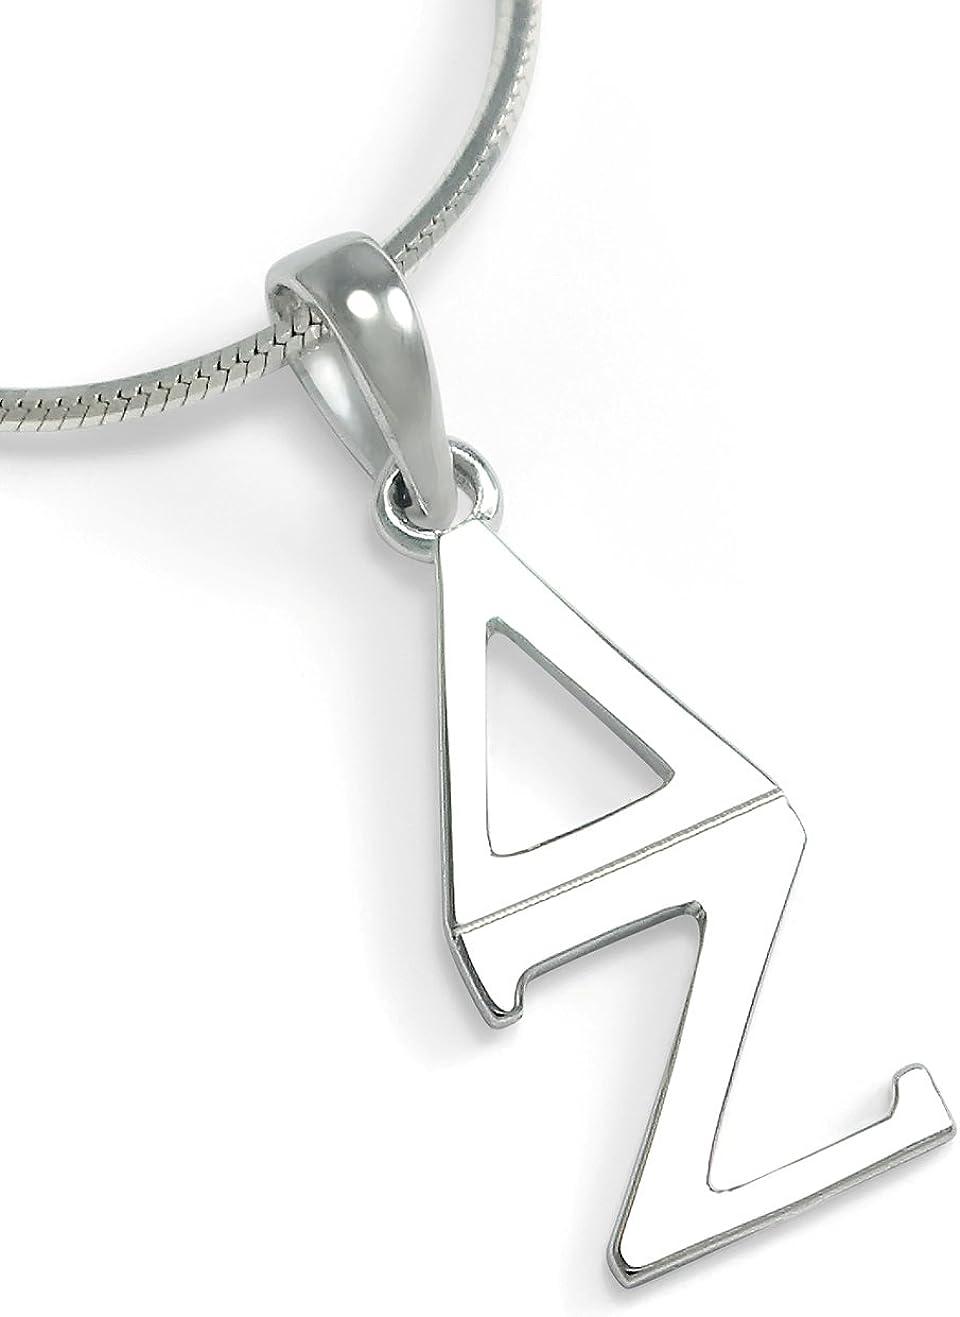 The Nashville-Davidson Mall Collegiate Standard Delta Zeta Choice Clas Sterling Silver Sorority